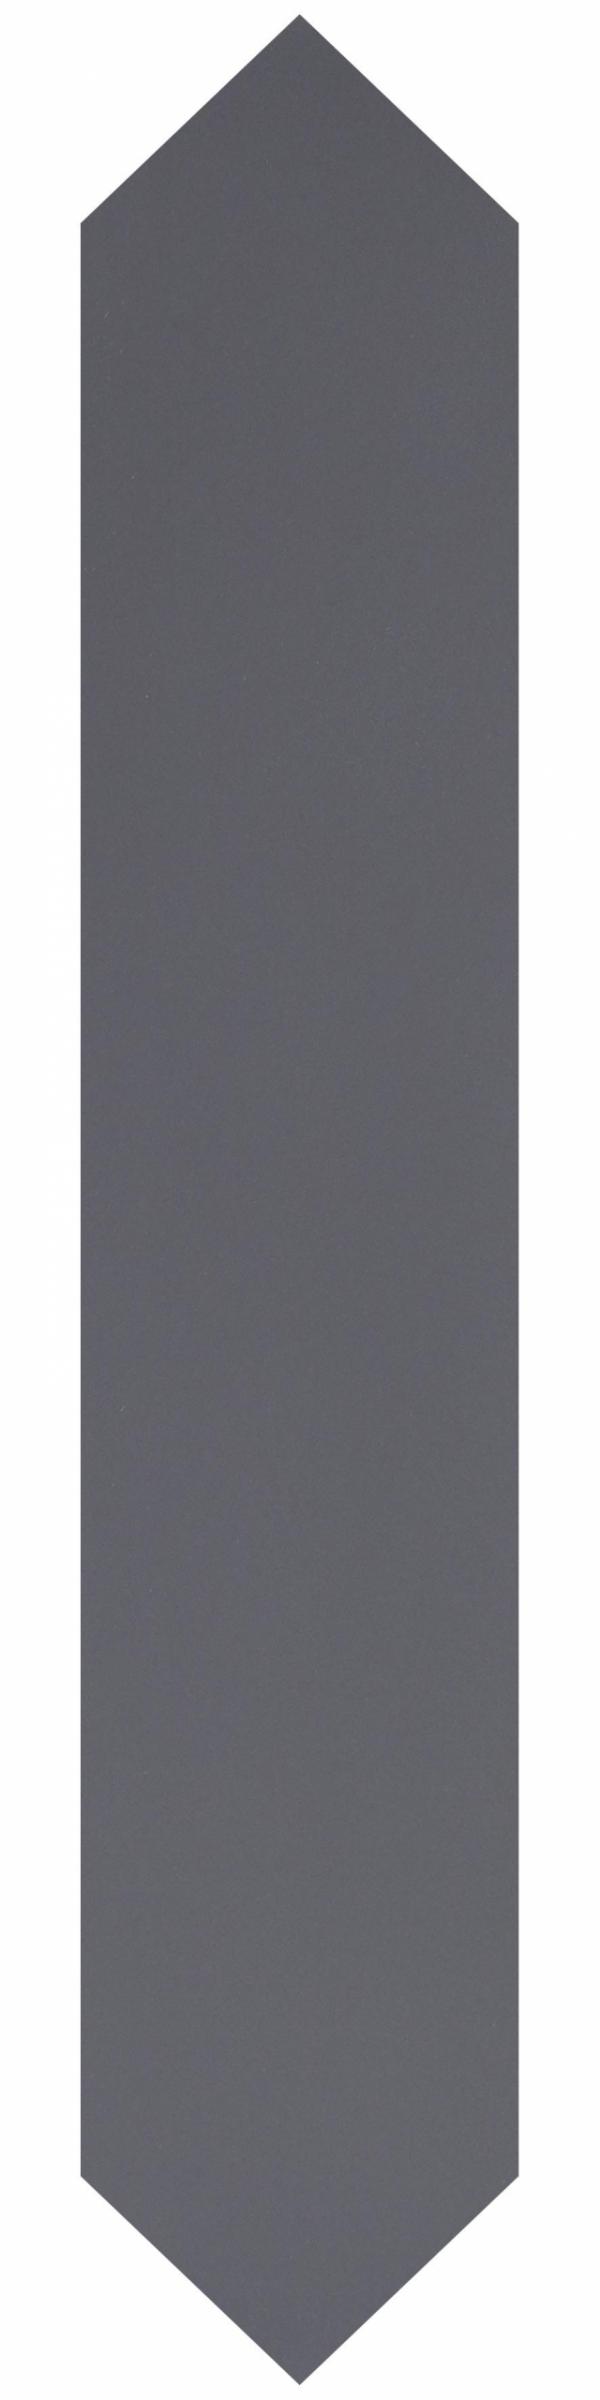 Gradient Crayon - Black Matt